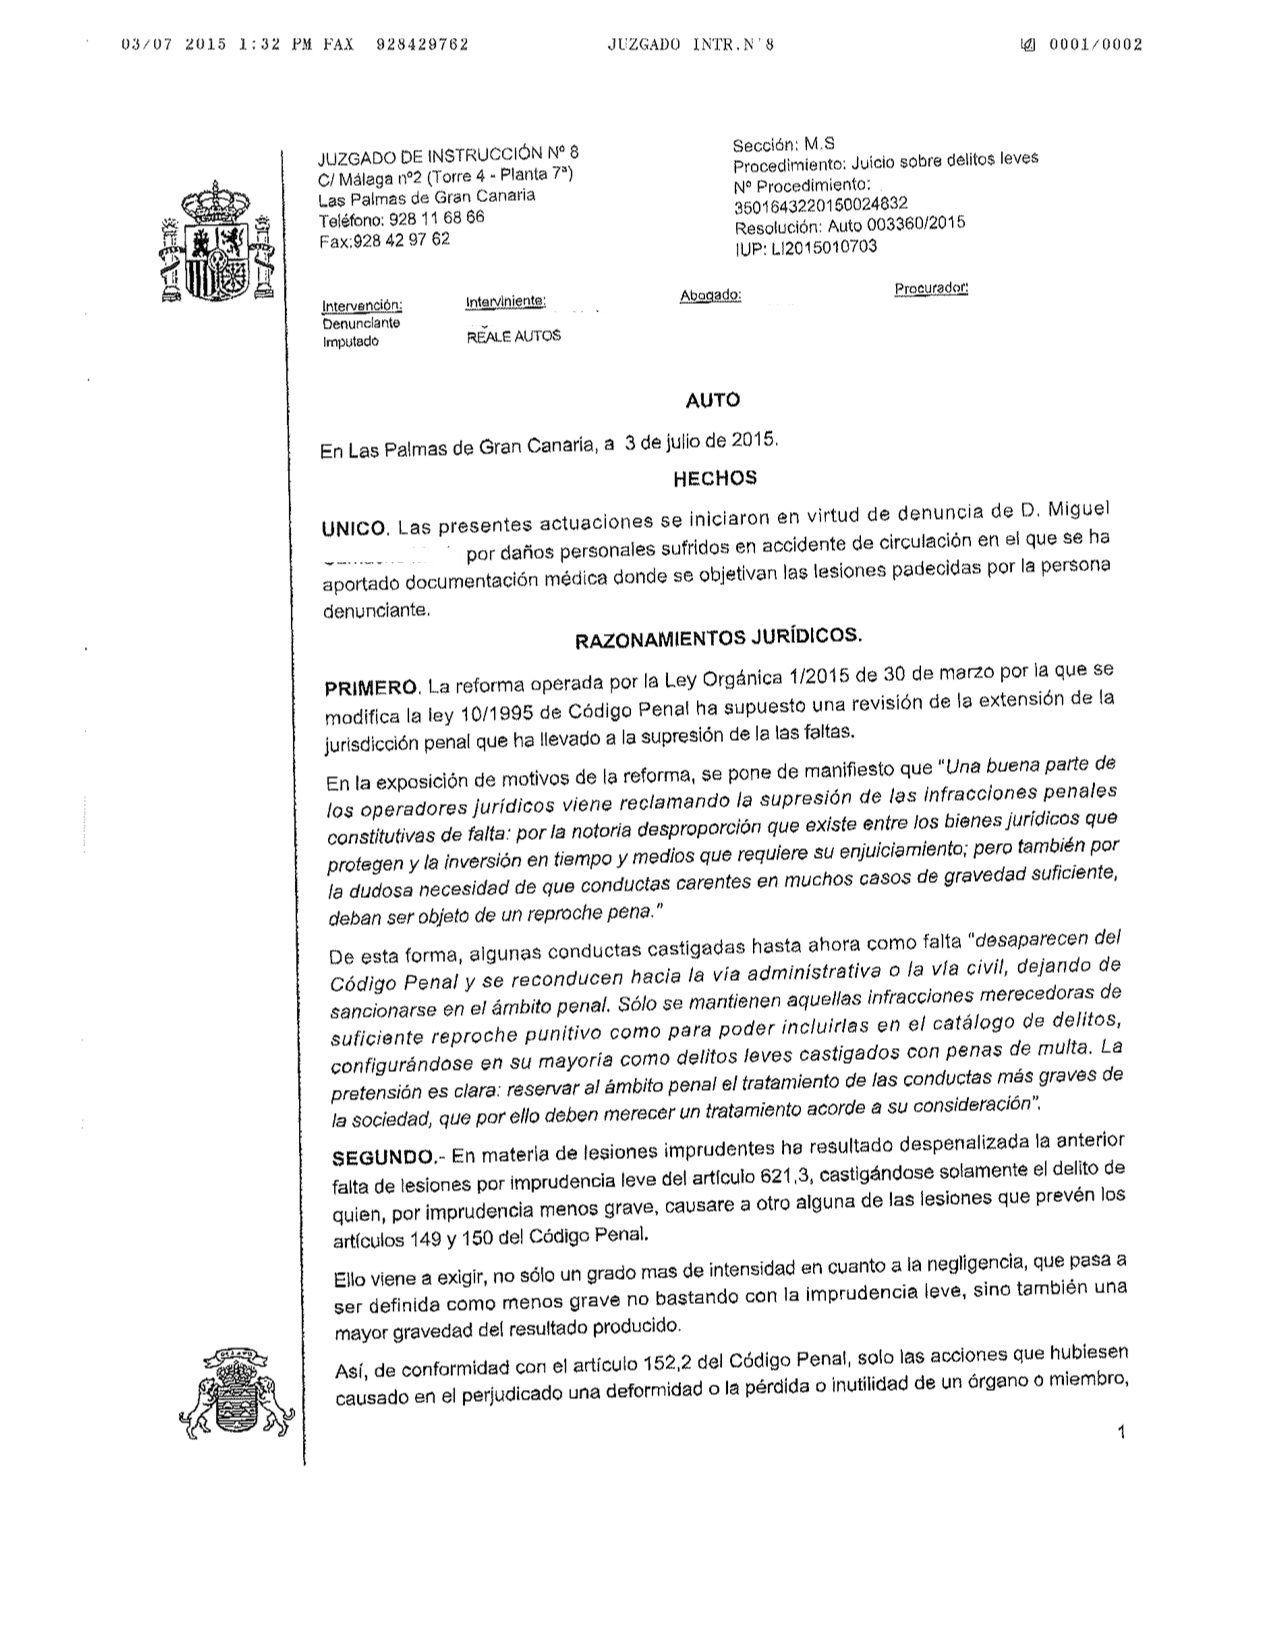 Pag 1-AUTO-INADMISION-DENUNCIA-TRAFICO-compressor